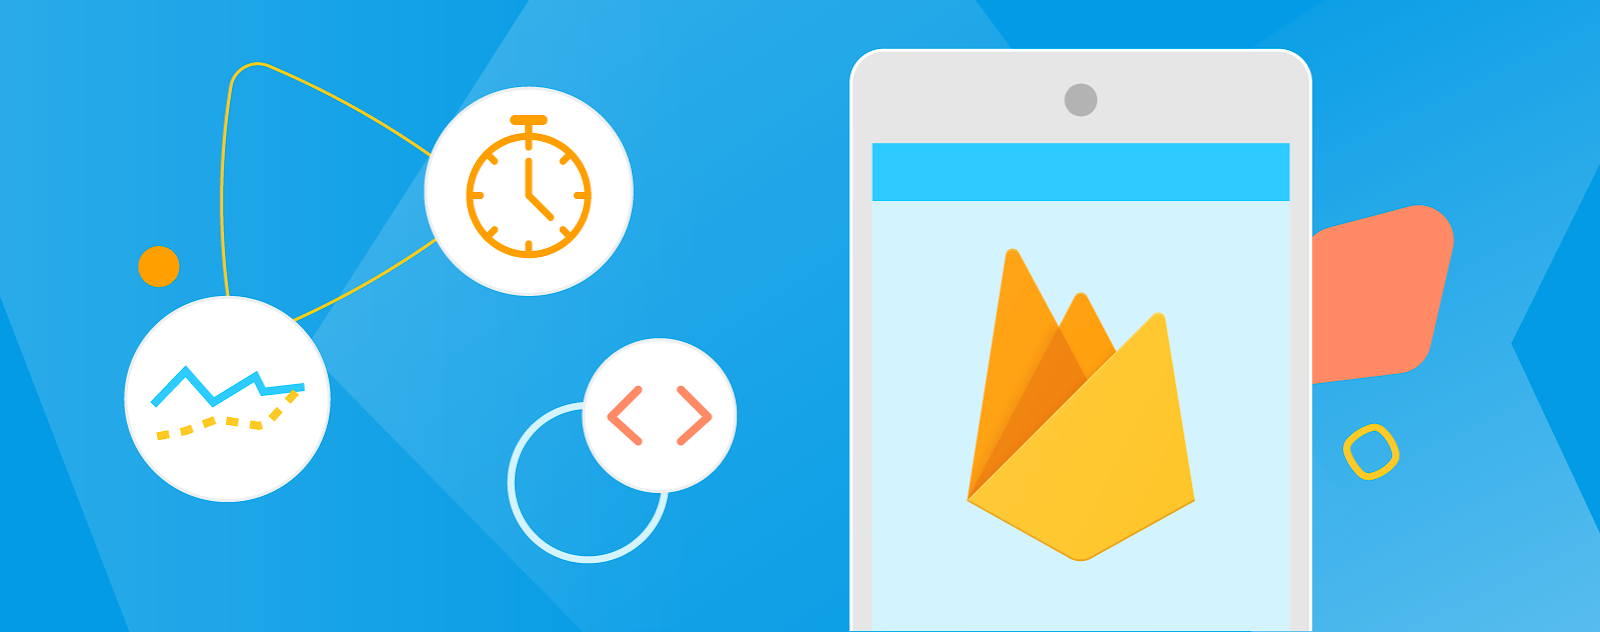 Firebase header